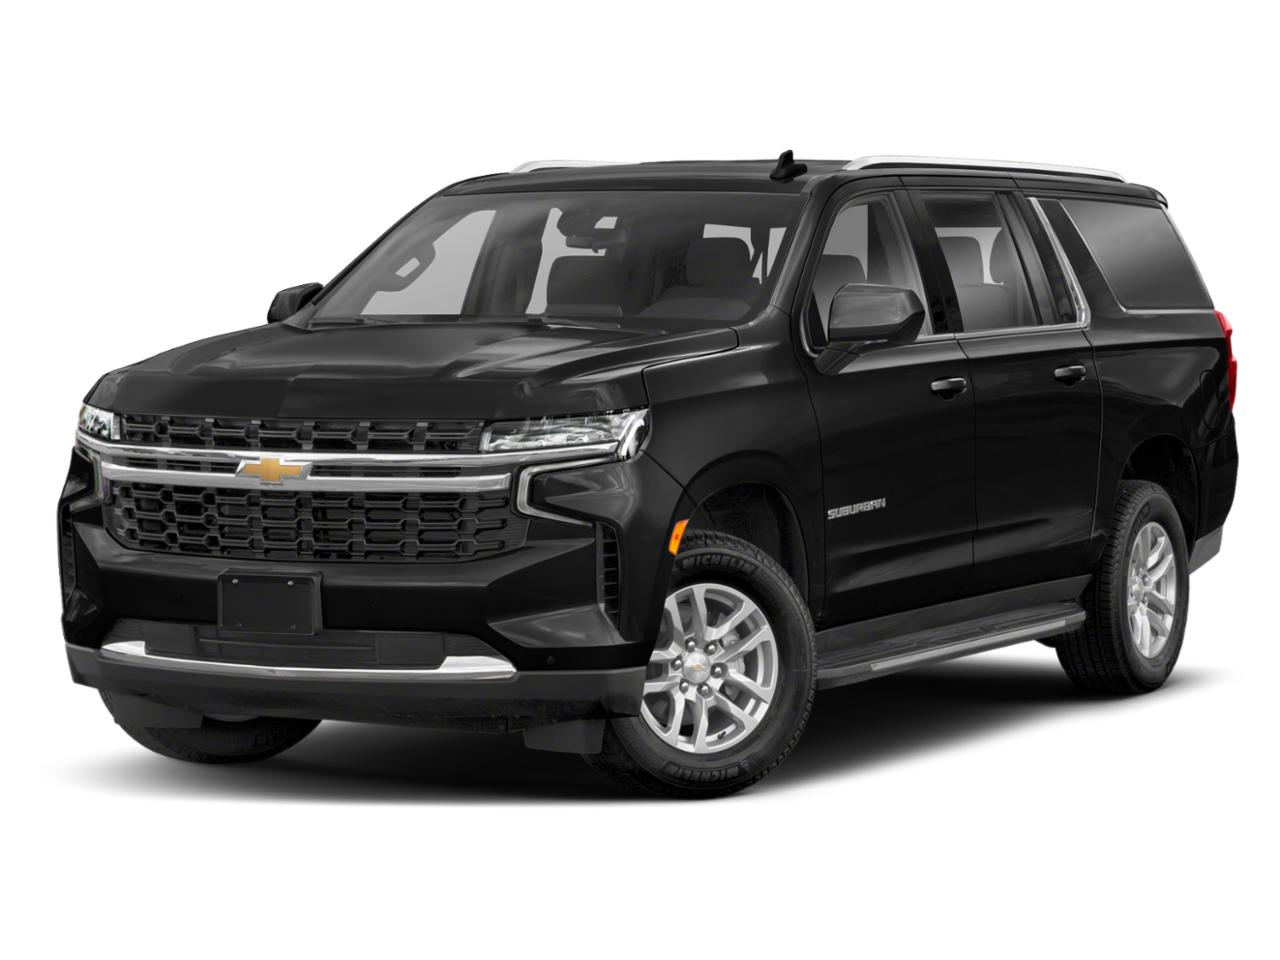 2021 Chevrolet Suburban Vehicle Photo in Washington, NJ 07882